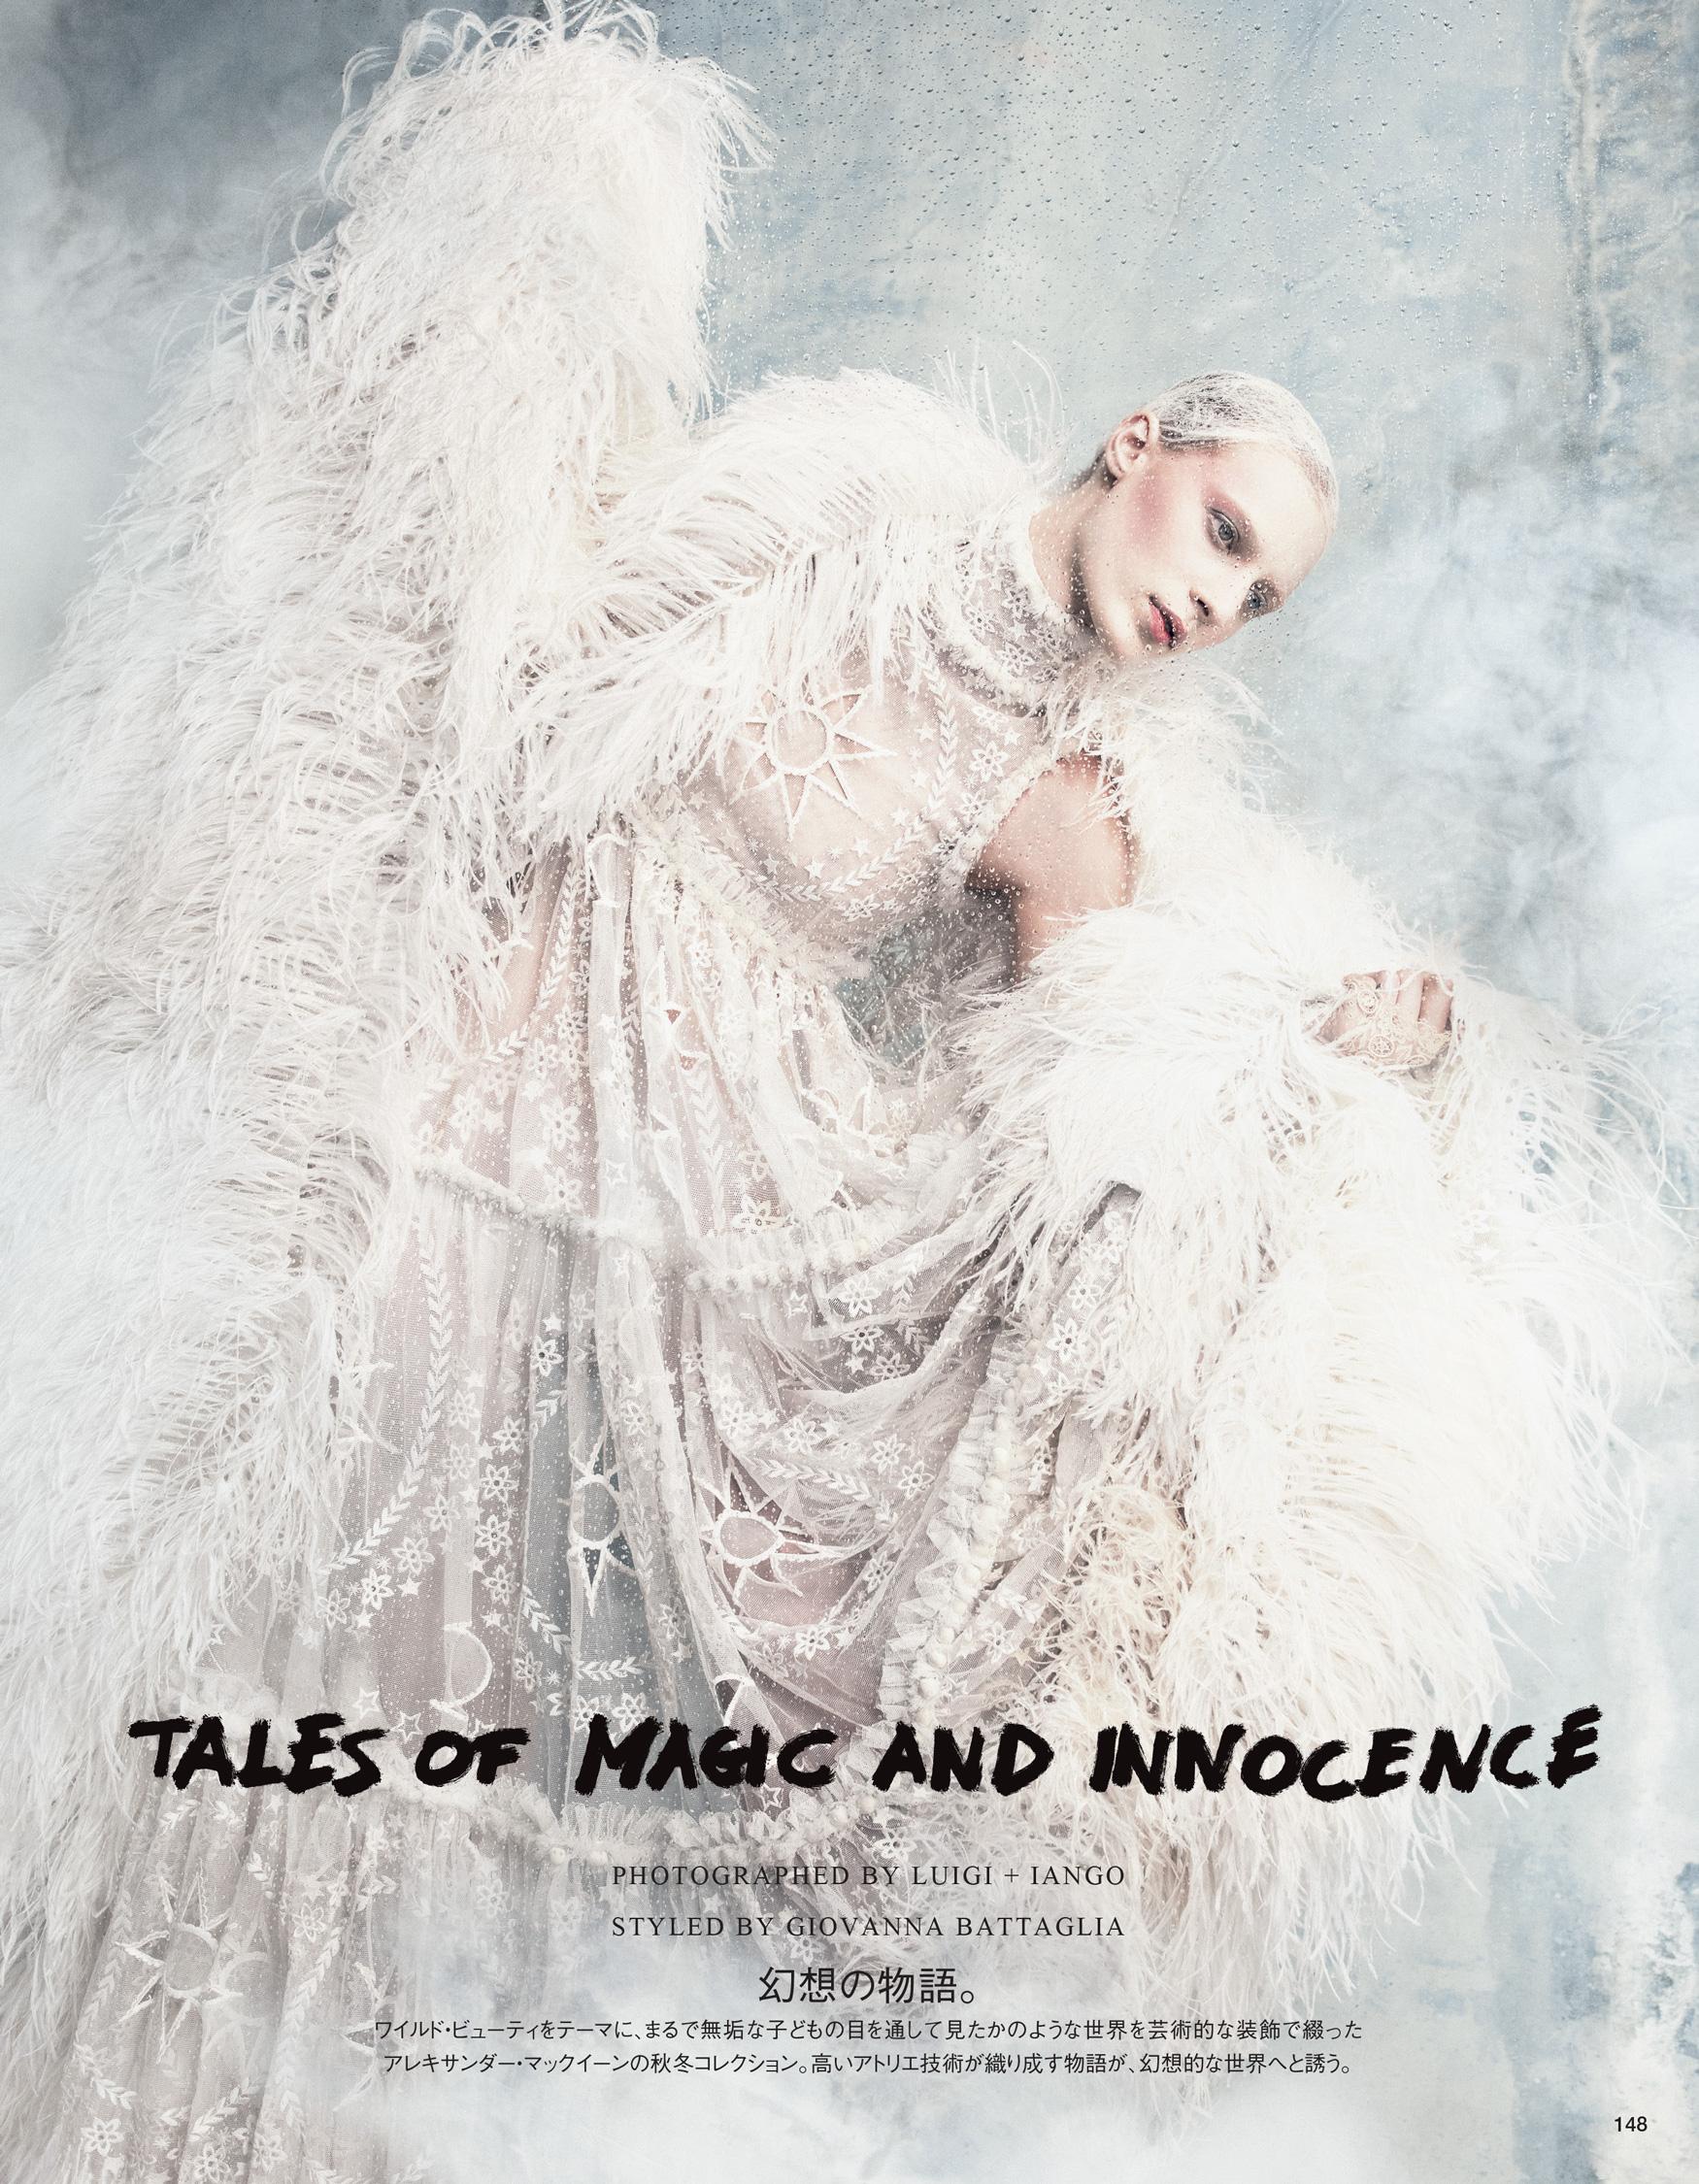 Giovanna-Battaglia-Tales-Of-Magic-And-Innocense-Vogue-Japan-Daniel-Iango-V181_148_200.jpg